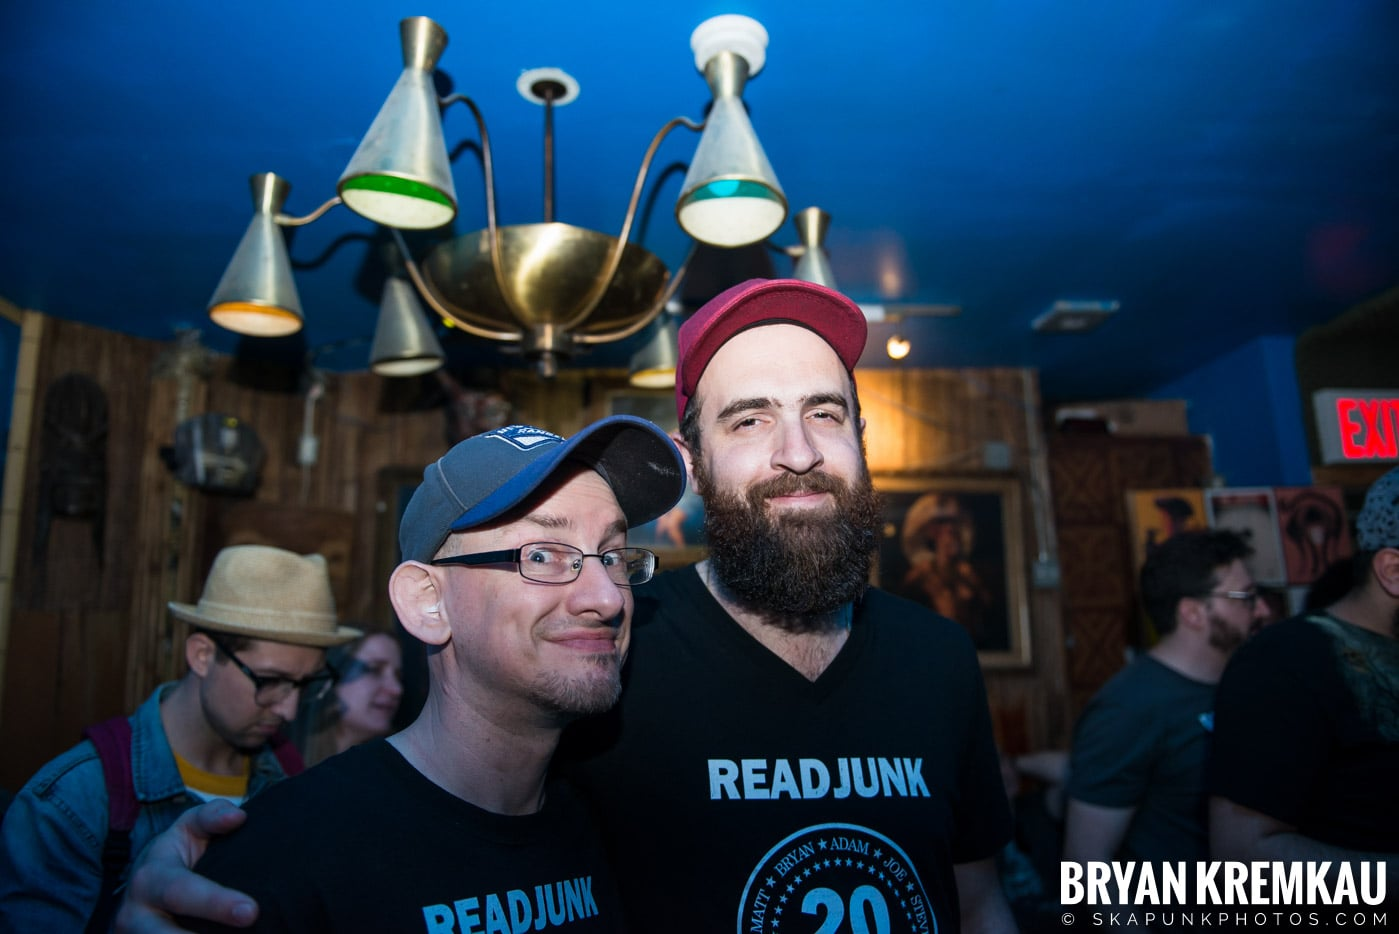 ReadJunk.com 20th Anniversary Party @ Otto's Shrunken Head, NYC - 4.29.17 (25)